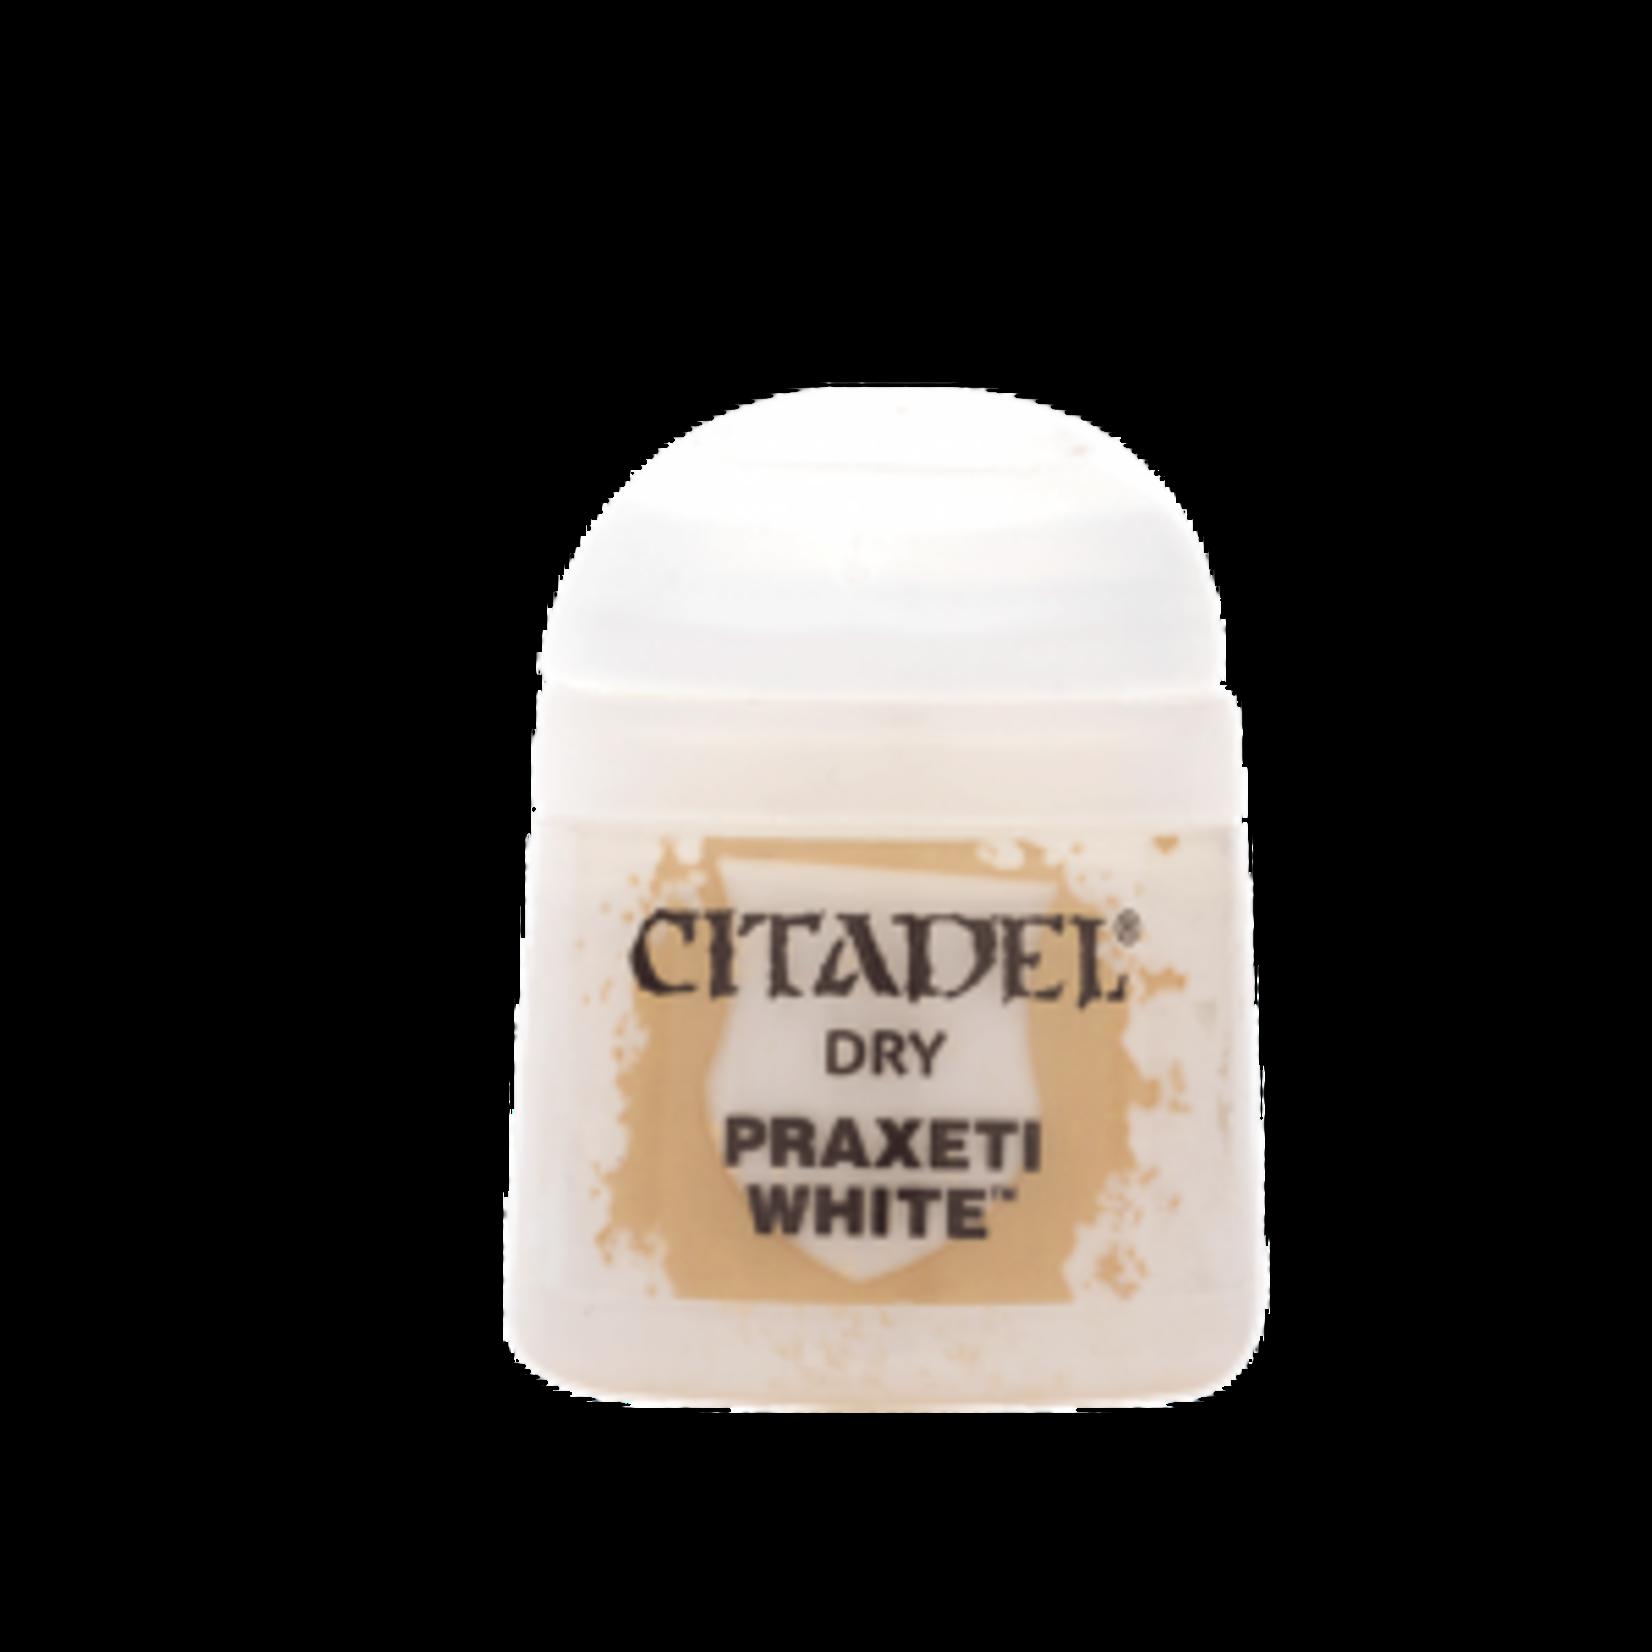 Citadel Dry Praxeti White